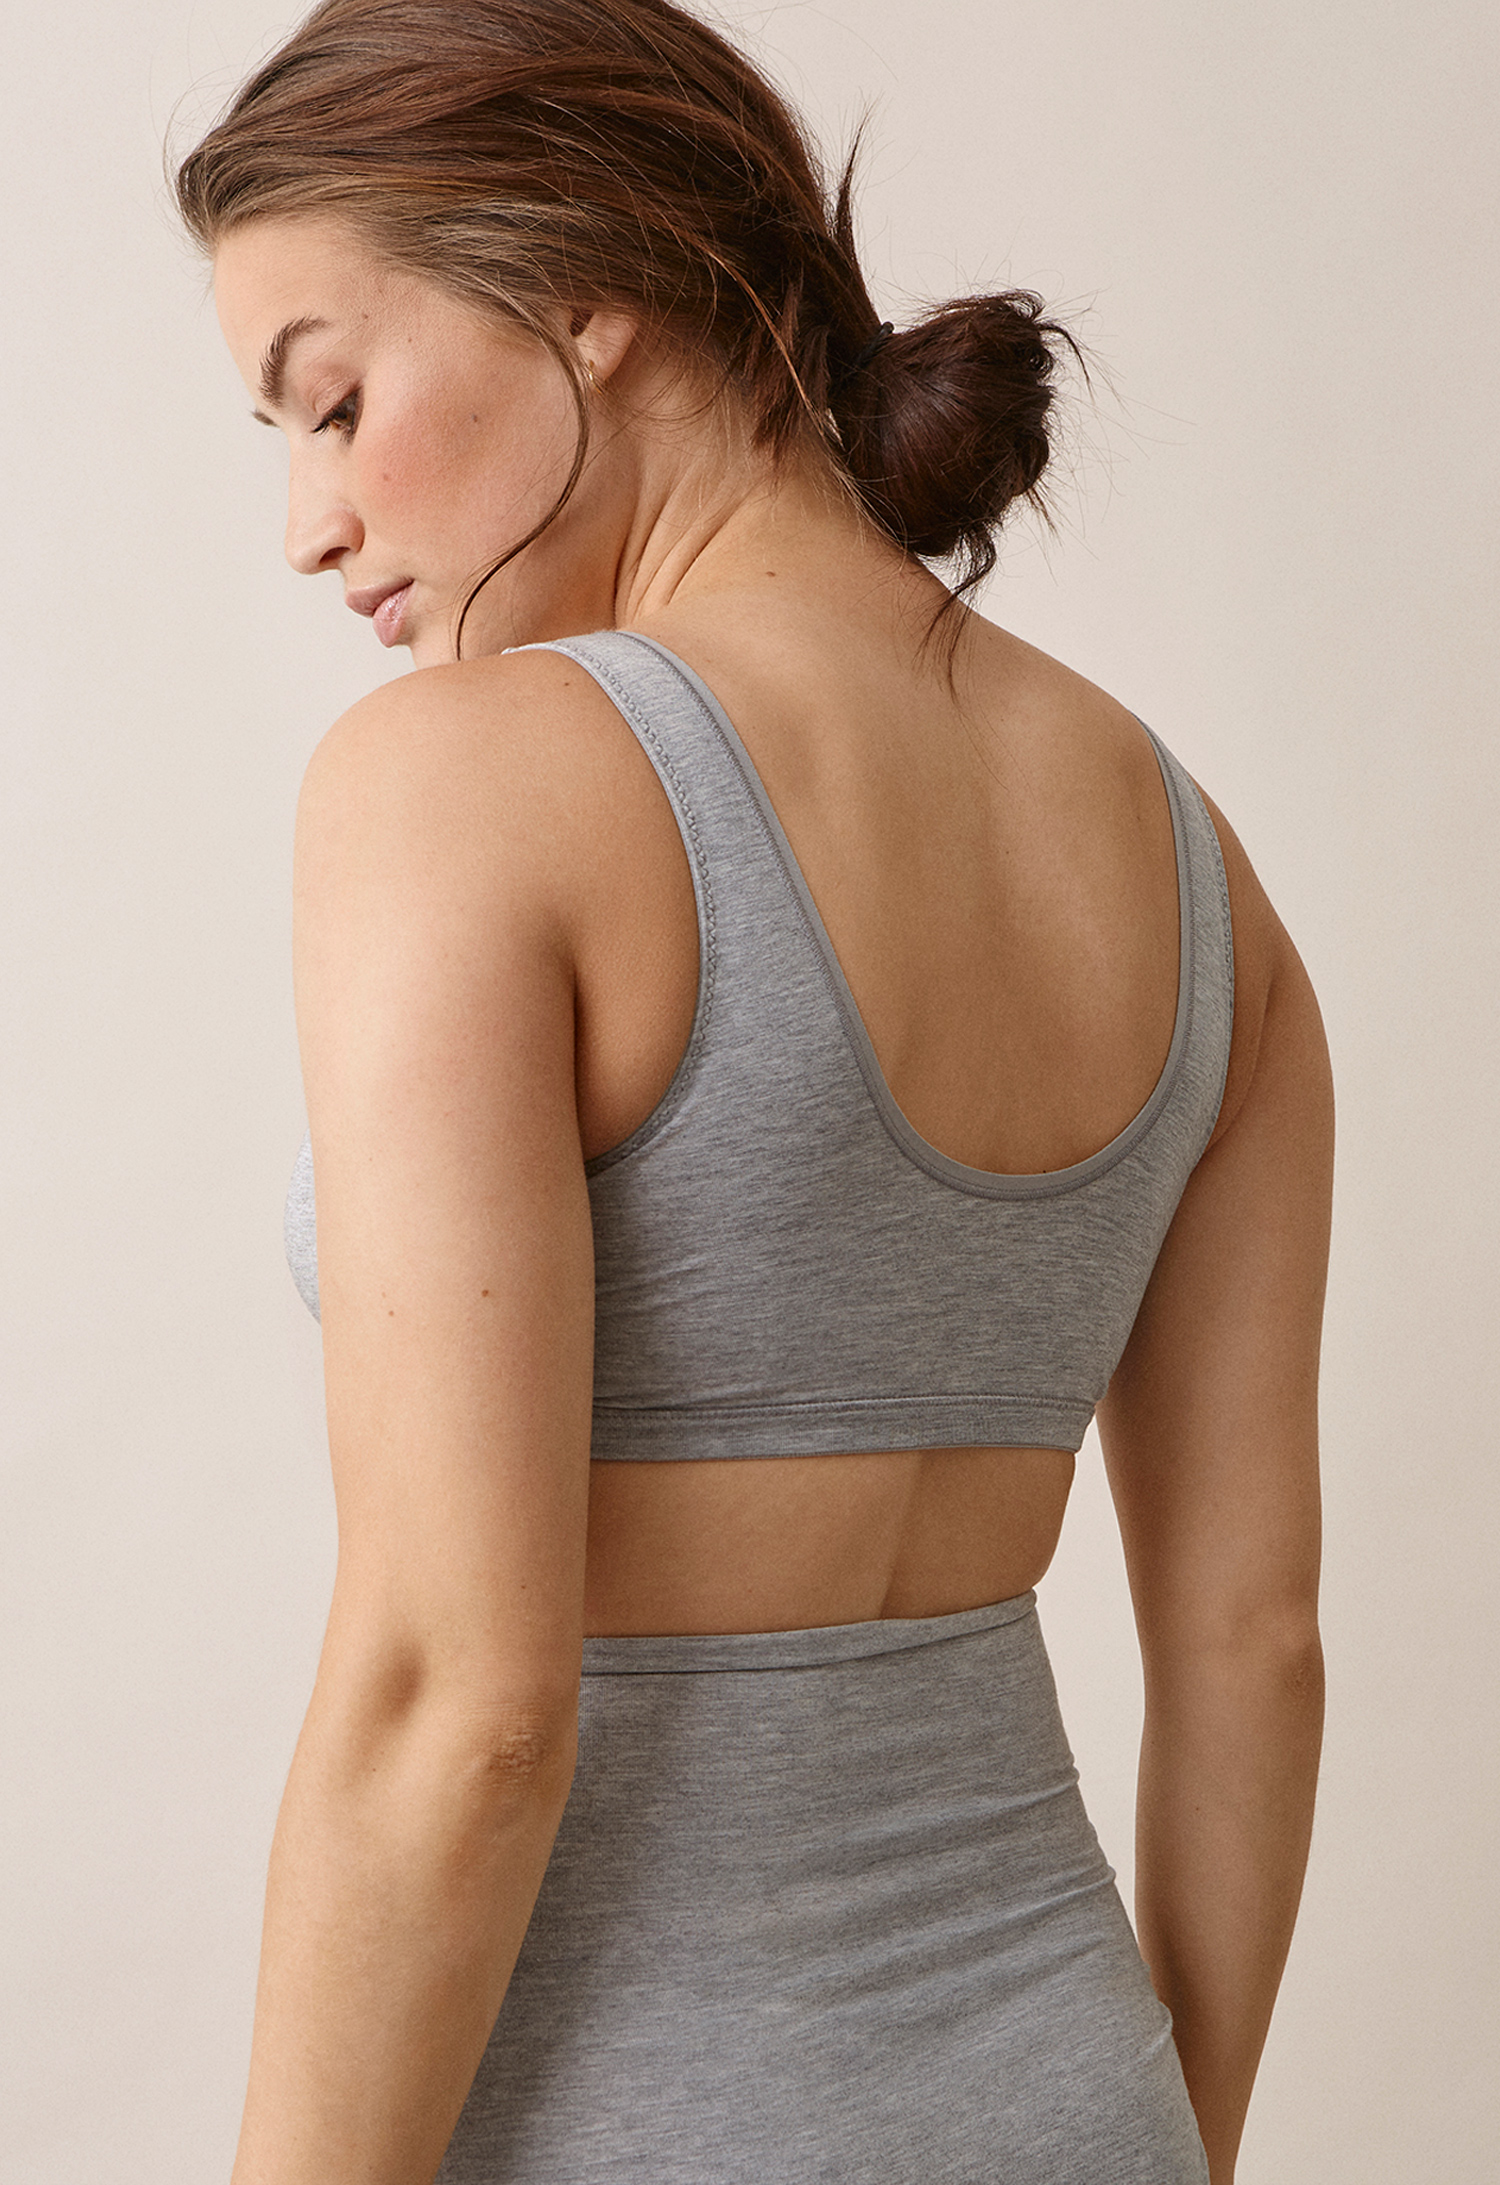 24/7 bragrey melange (2) - Maternity underwear / Nursing underwear